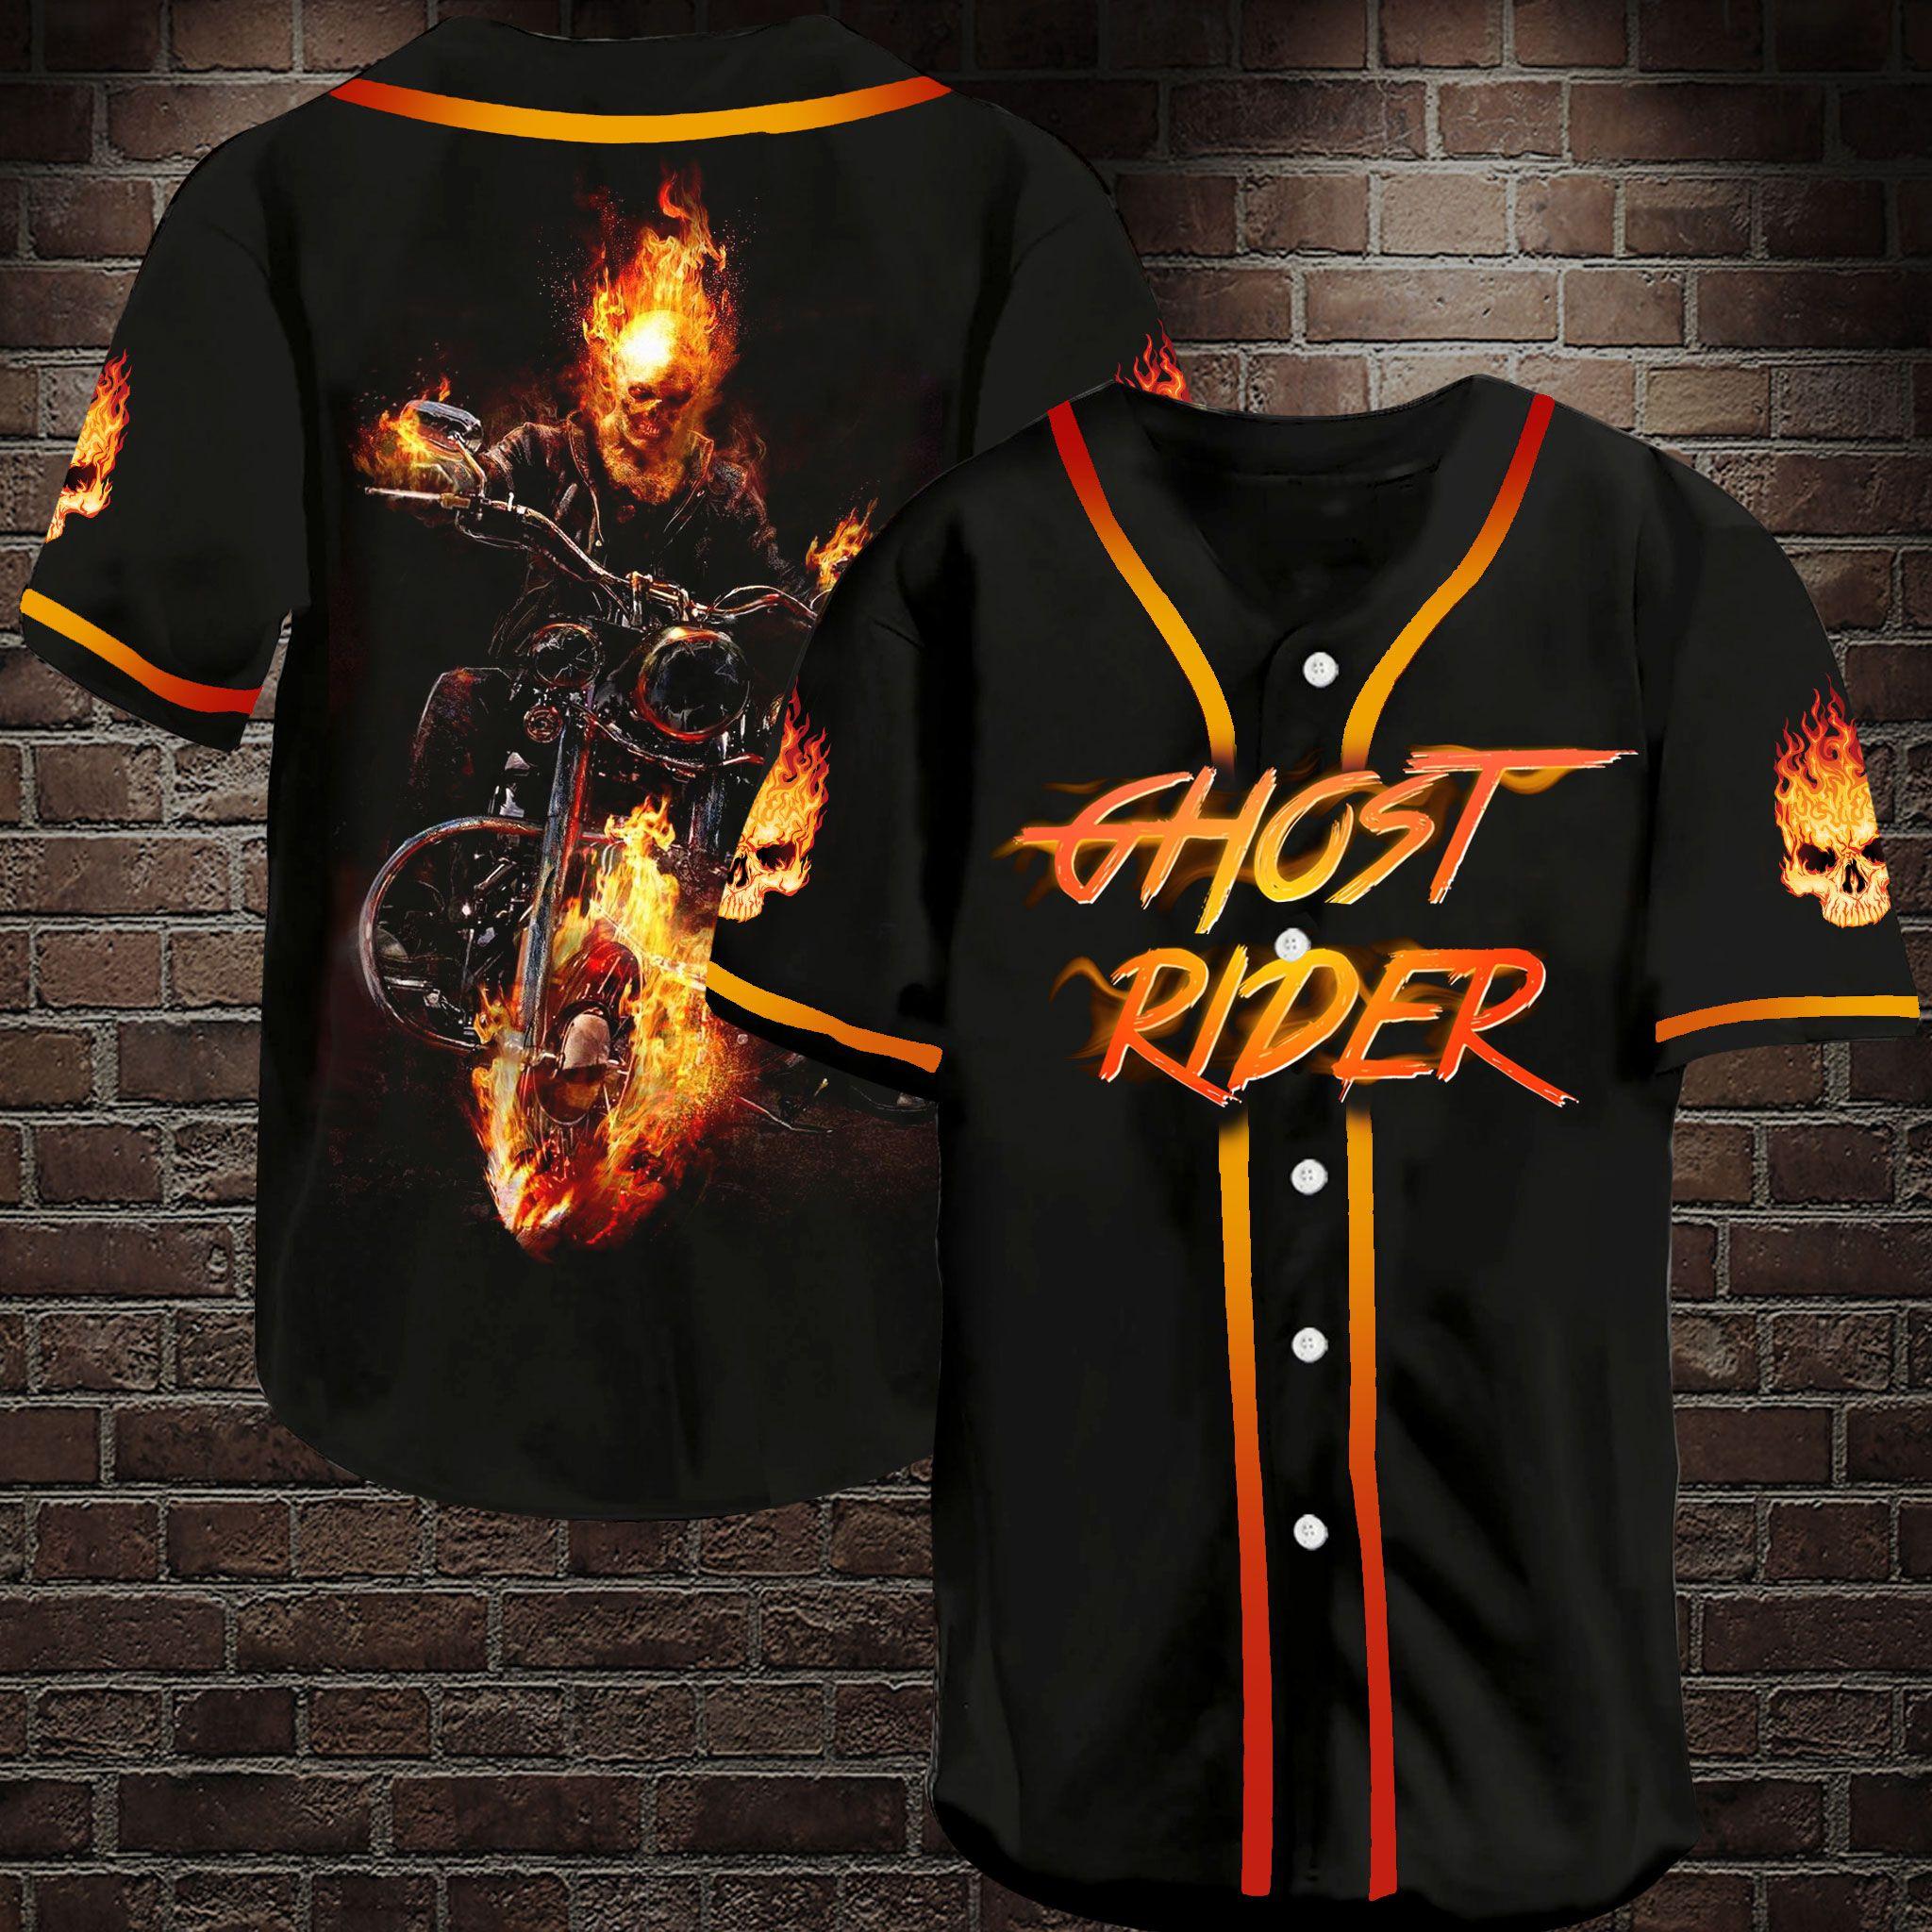 Ghost Rider Baseball Jersey Shirt